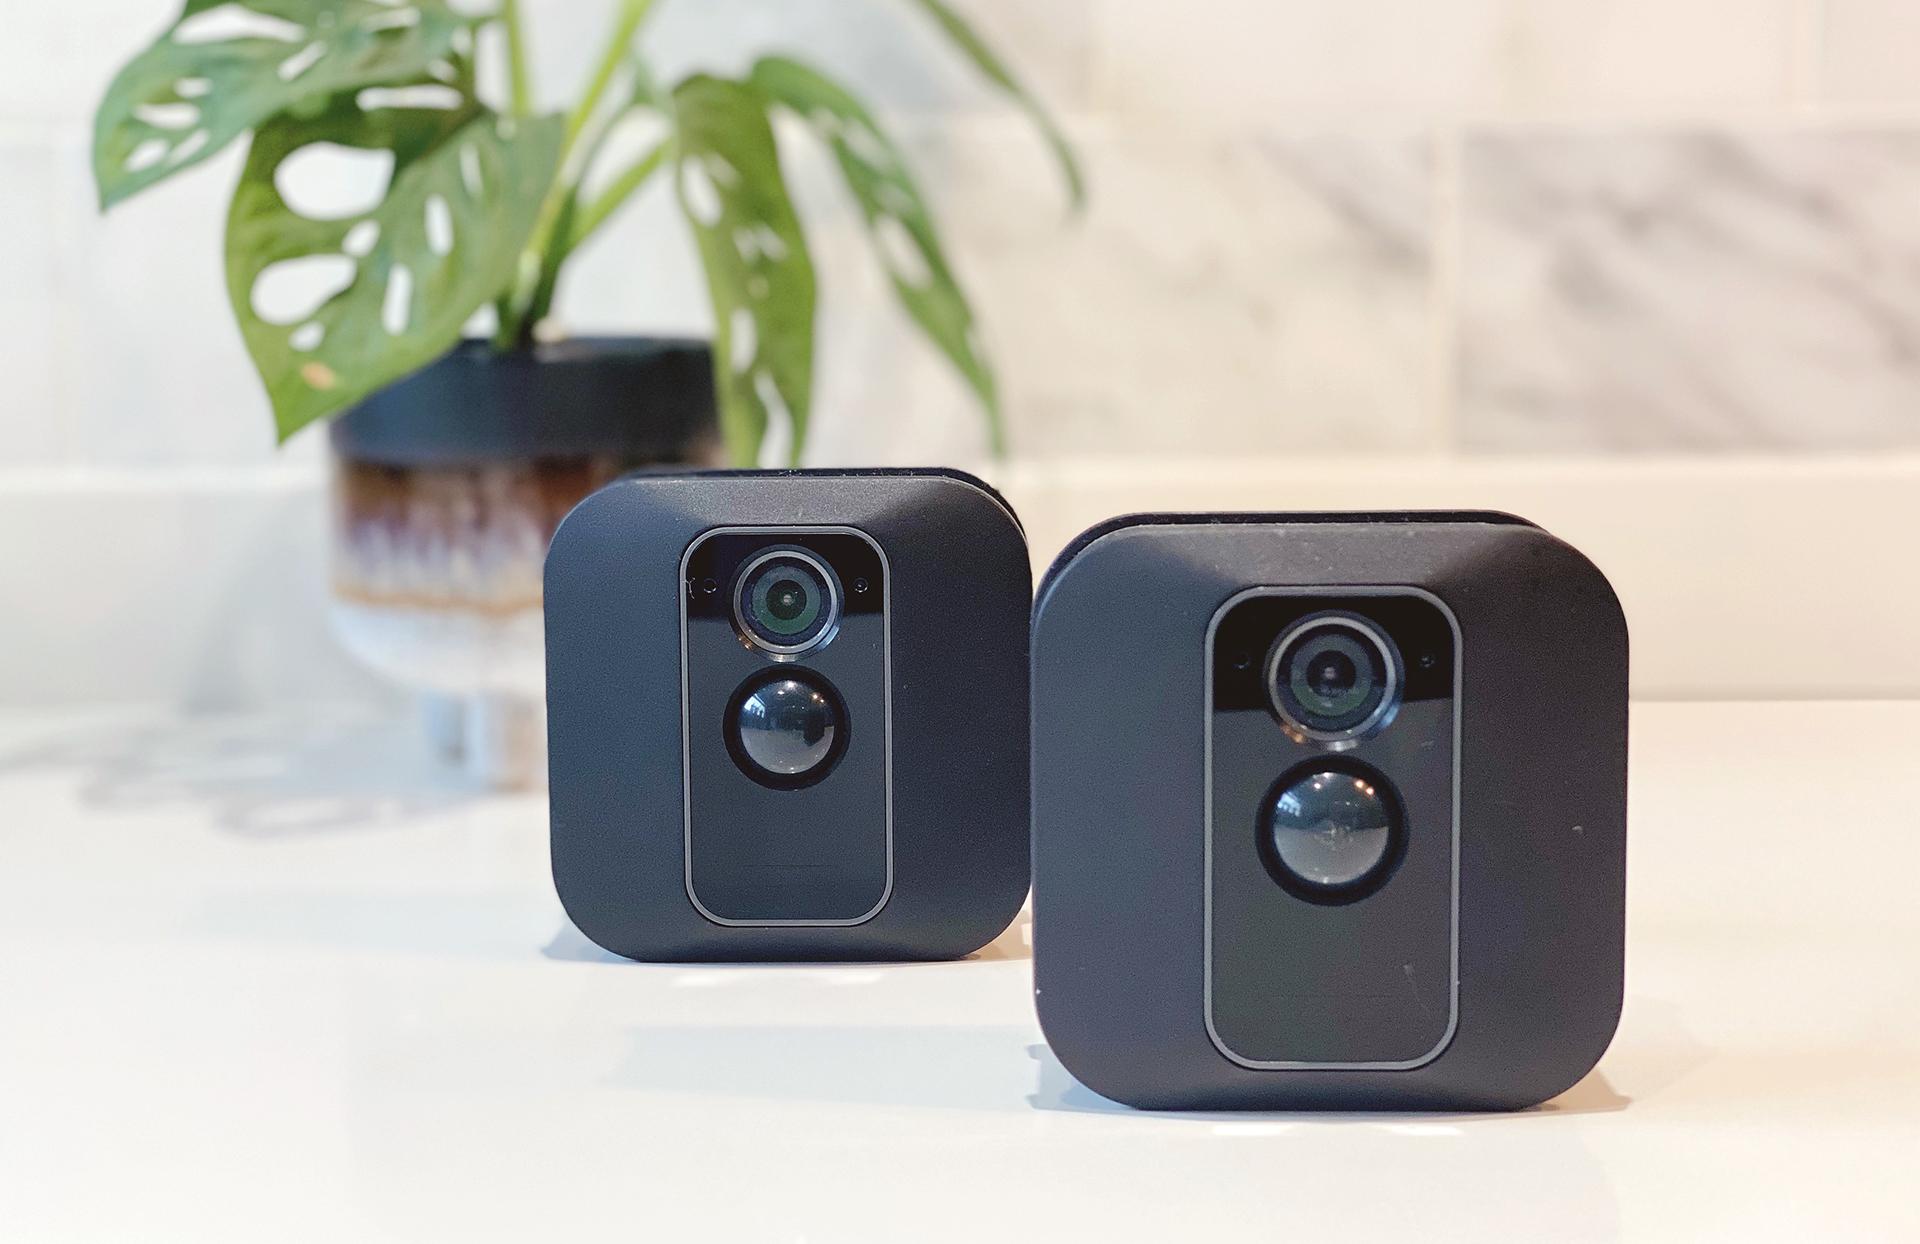 Blink security cameras